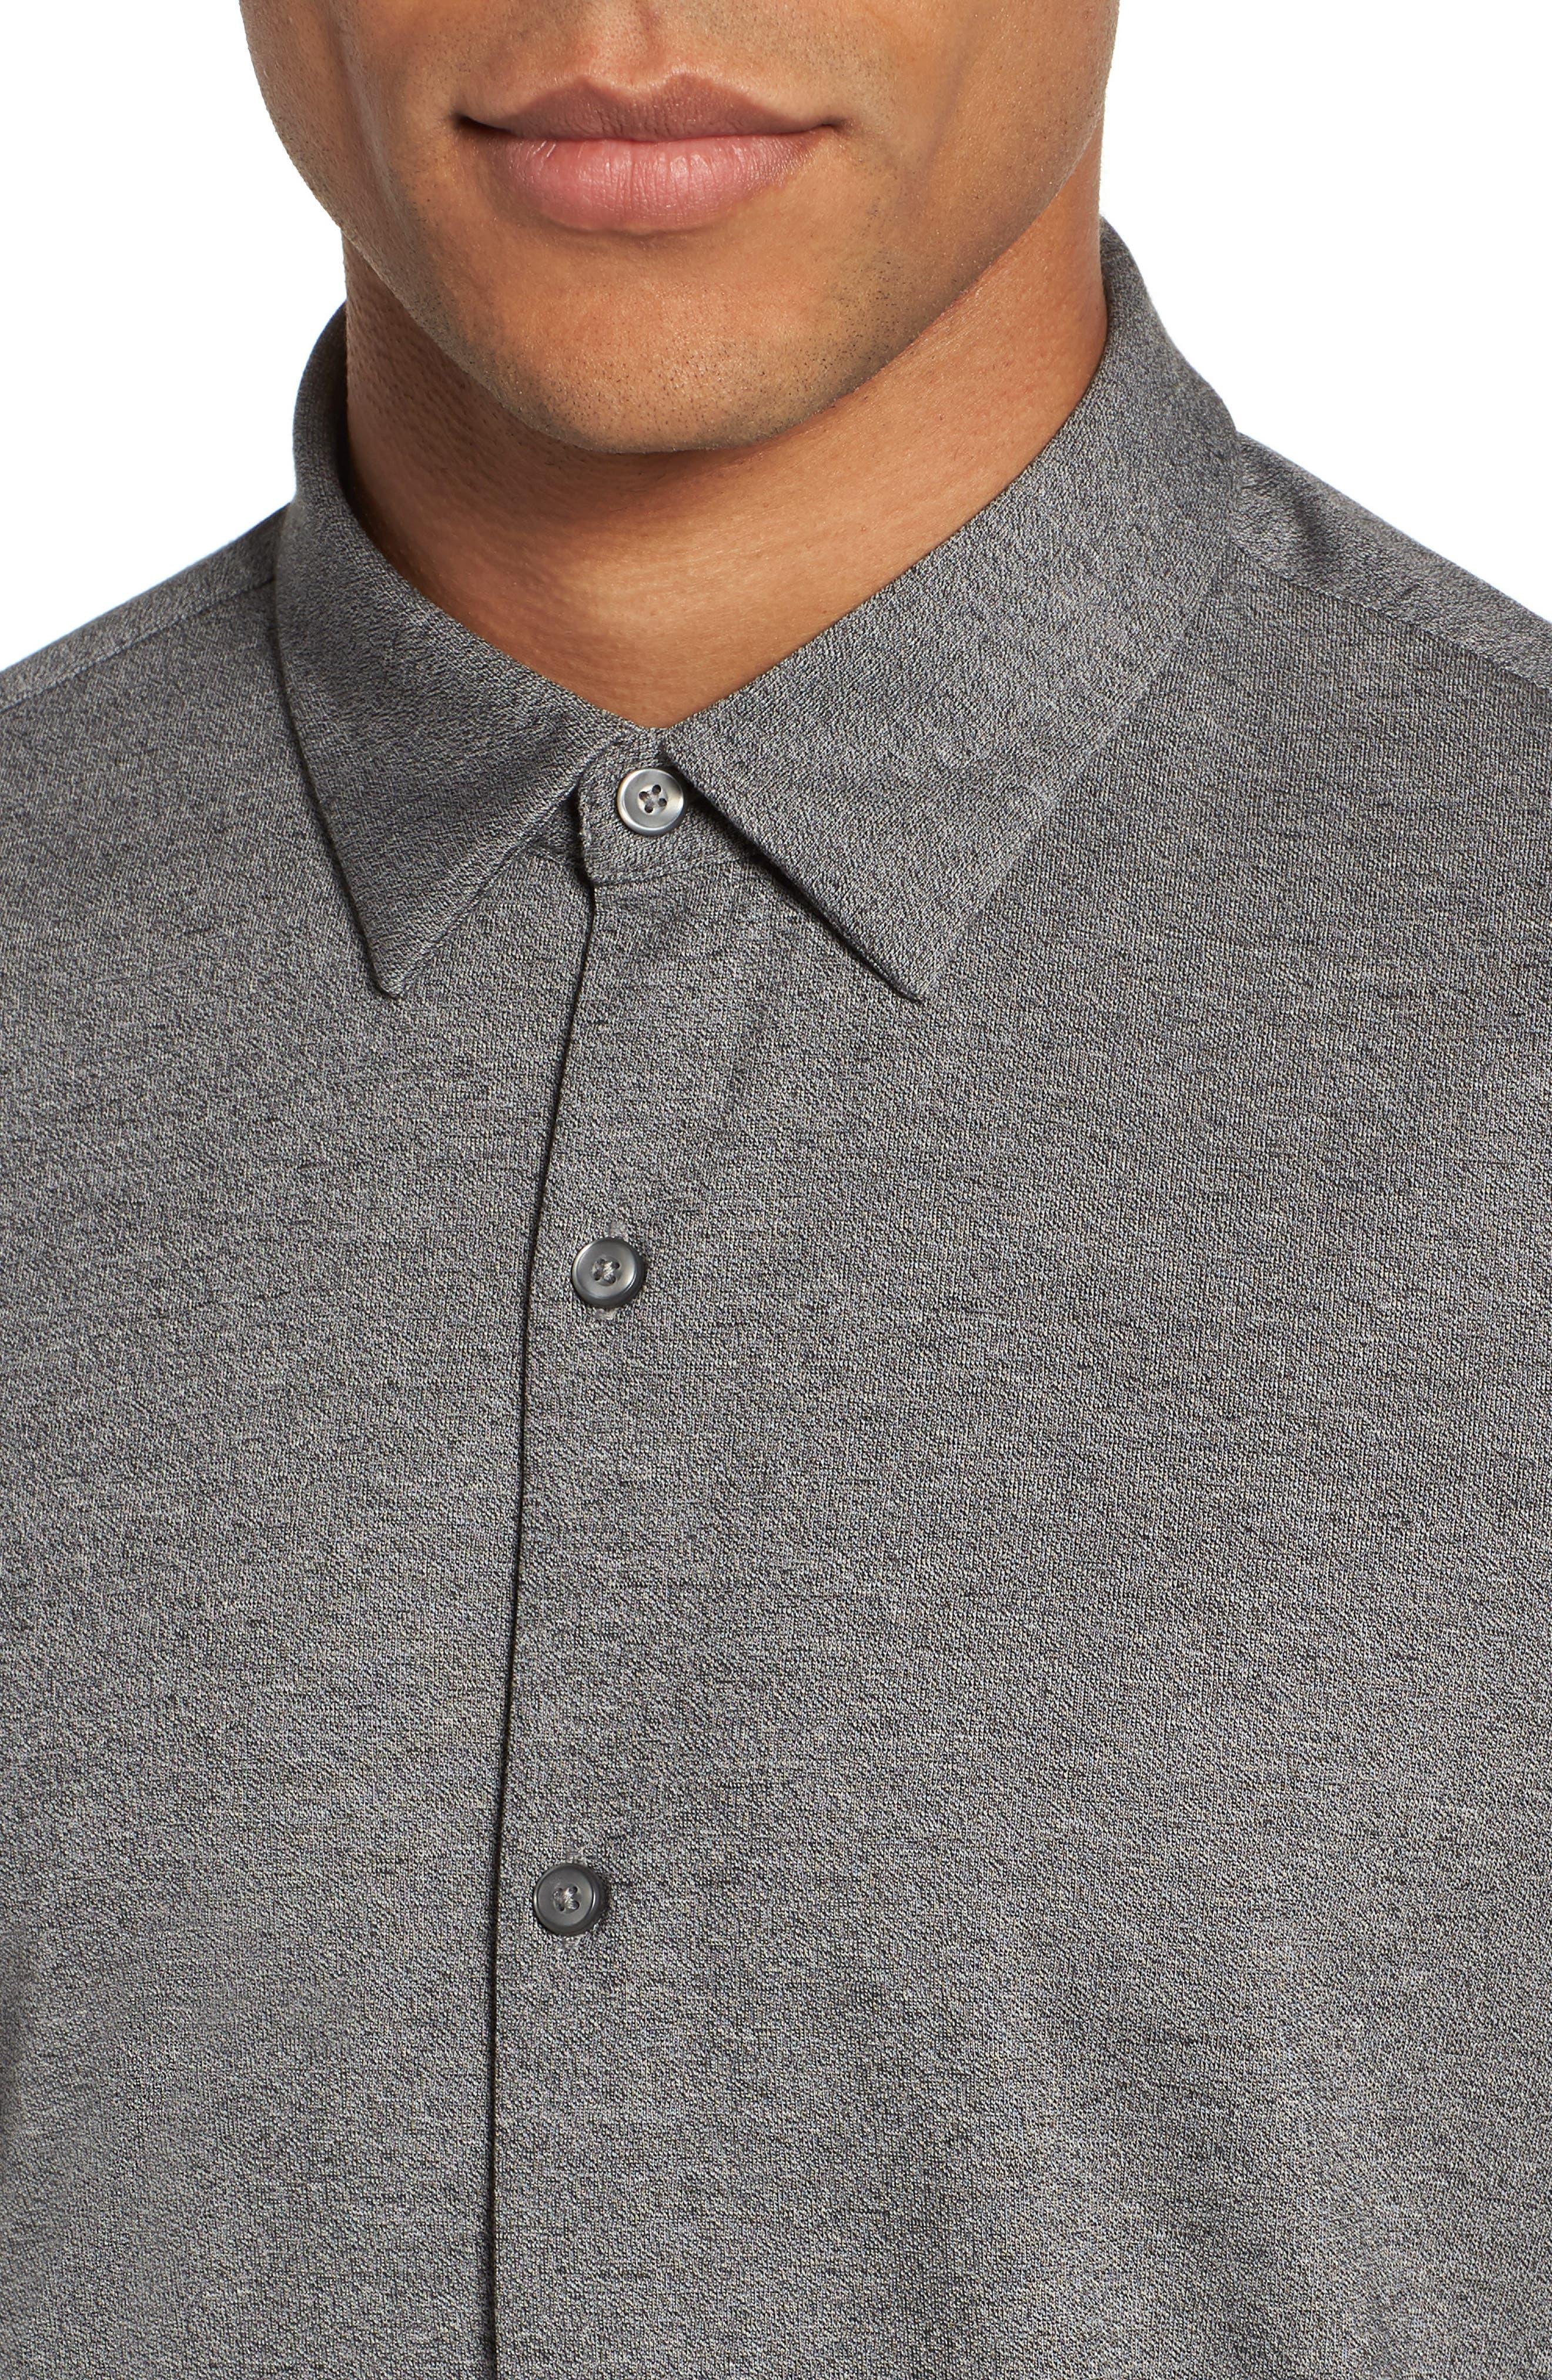 Knit Sport Shirt,                             Alternate thumbnail 4, color,                             030